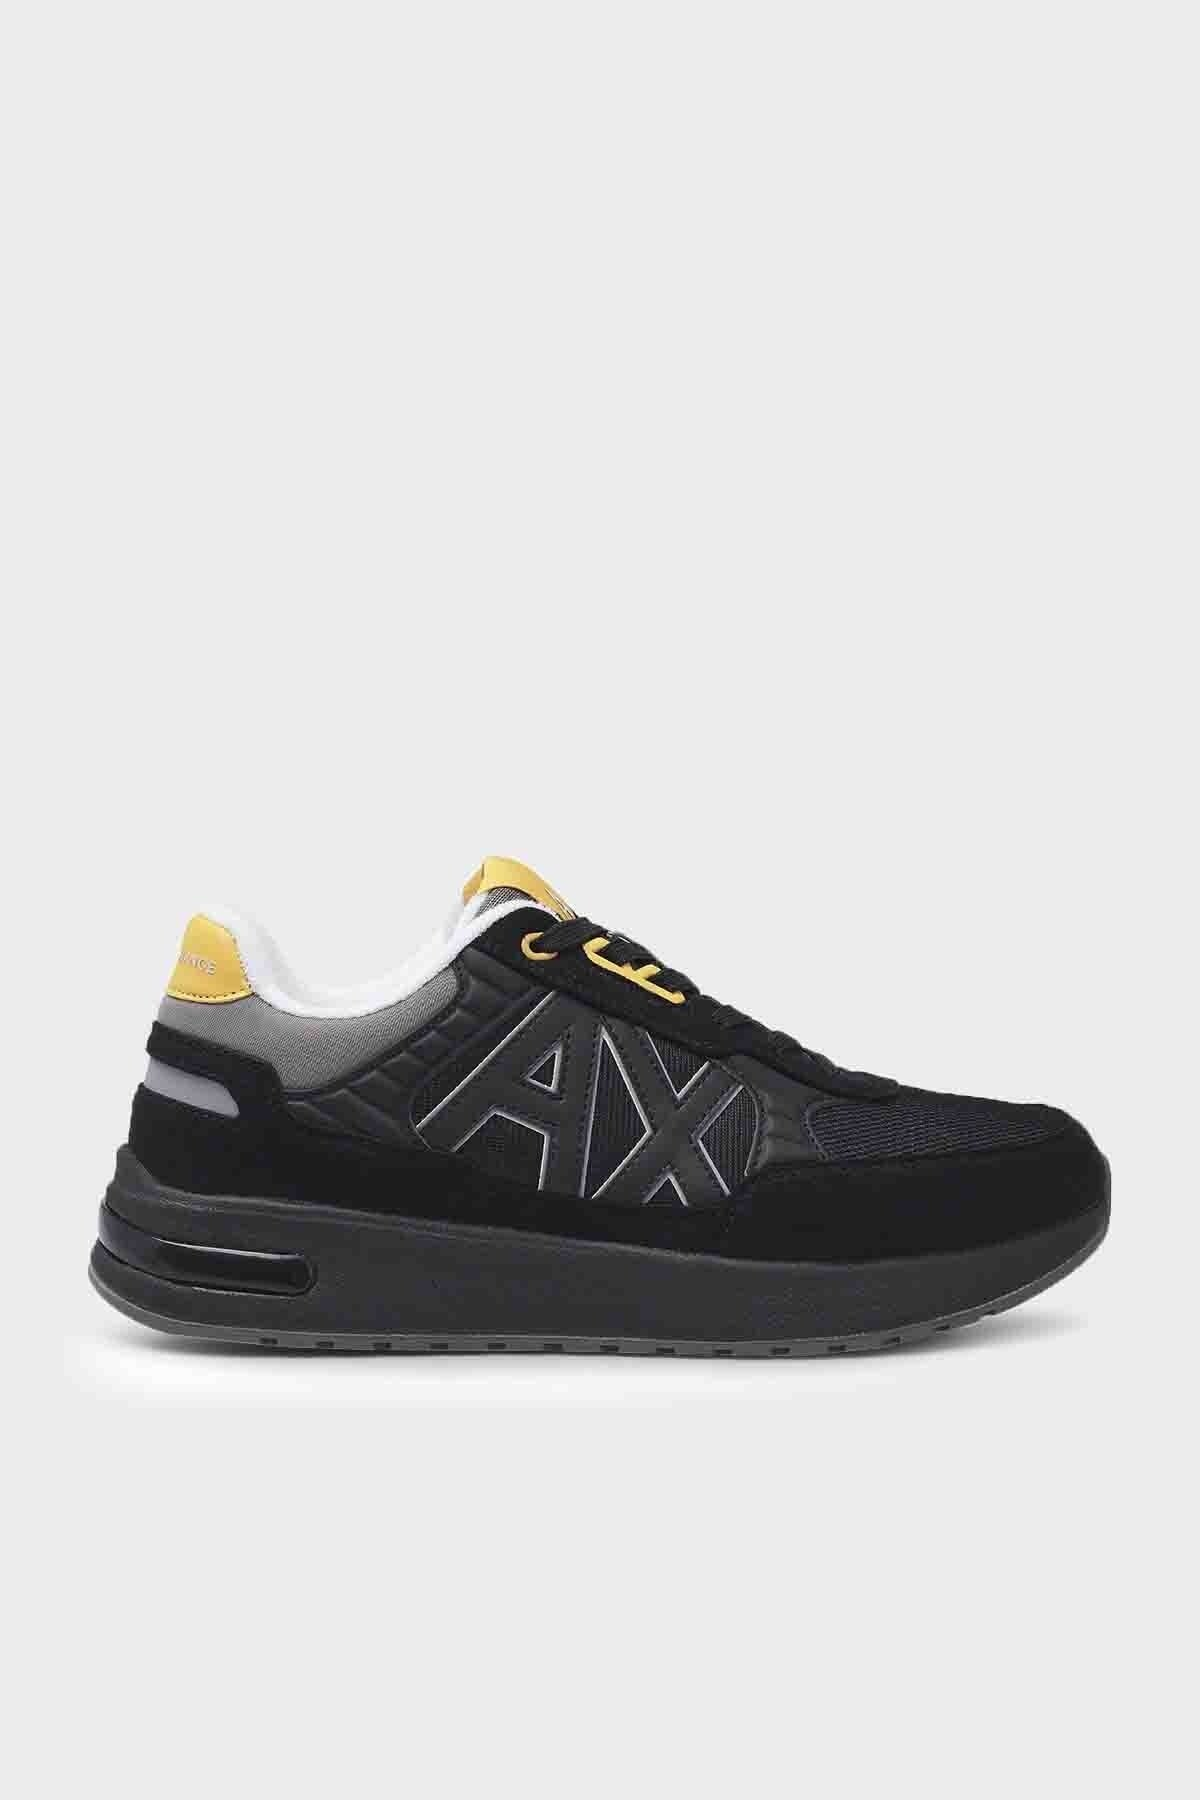 Armani Exchange Erkek Ayakkabı XUX052 XV205 R625 SİYAH